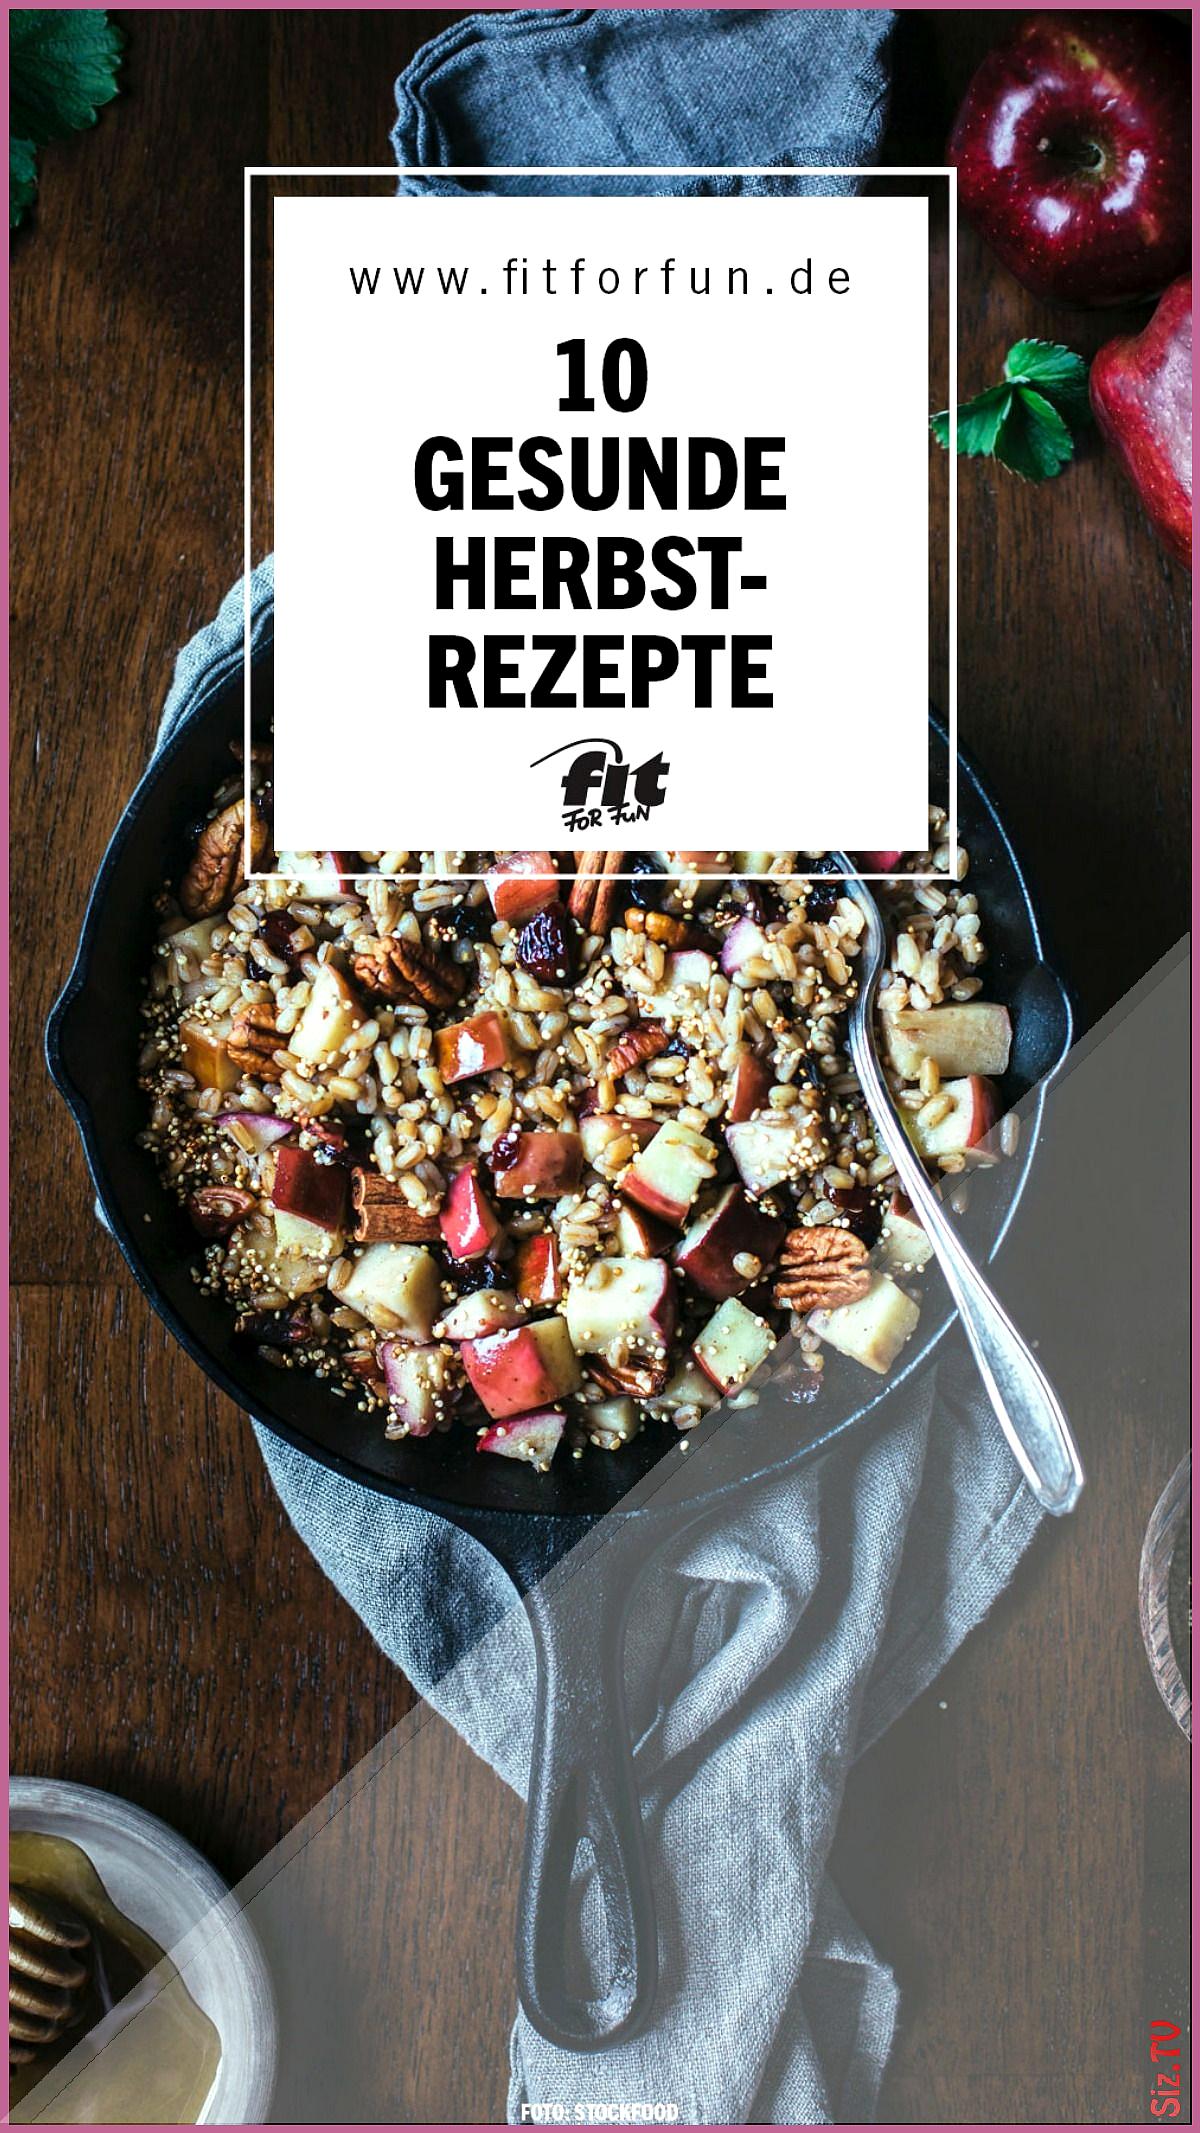 10 gesunde Herbst-Rezepte 10 gesunde Herbst-Rezepte FIT FOR FUN fit for fun Gesunde Herbstrezepte De...